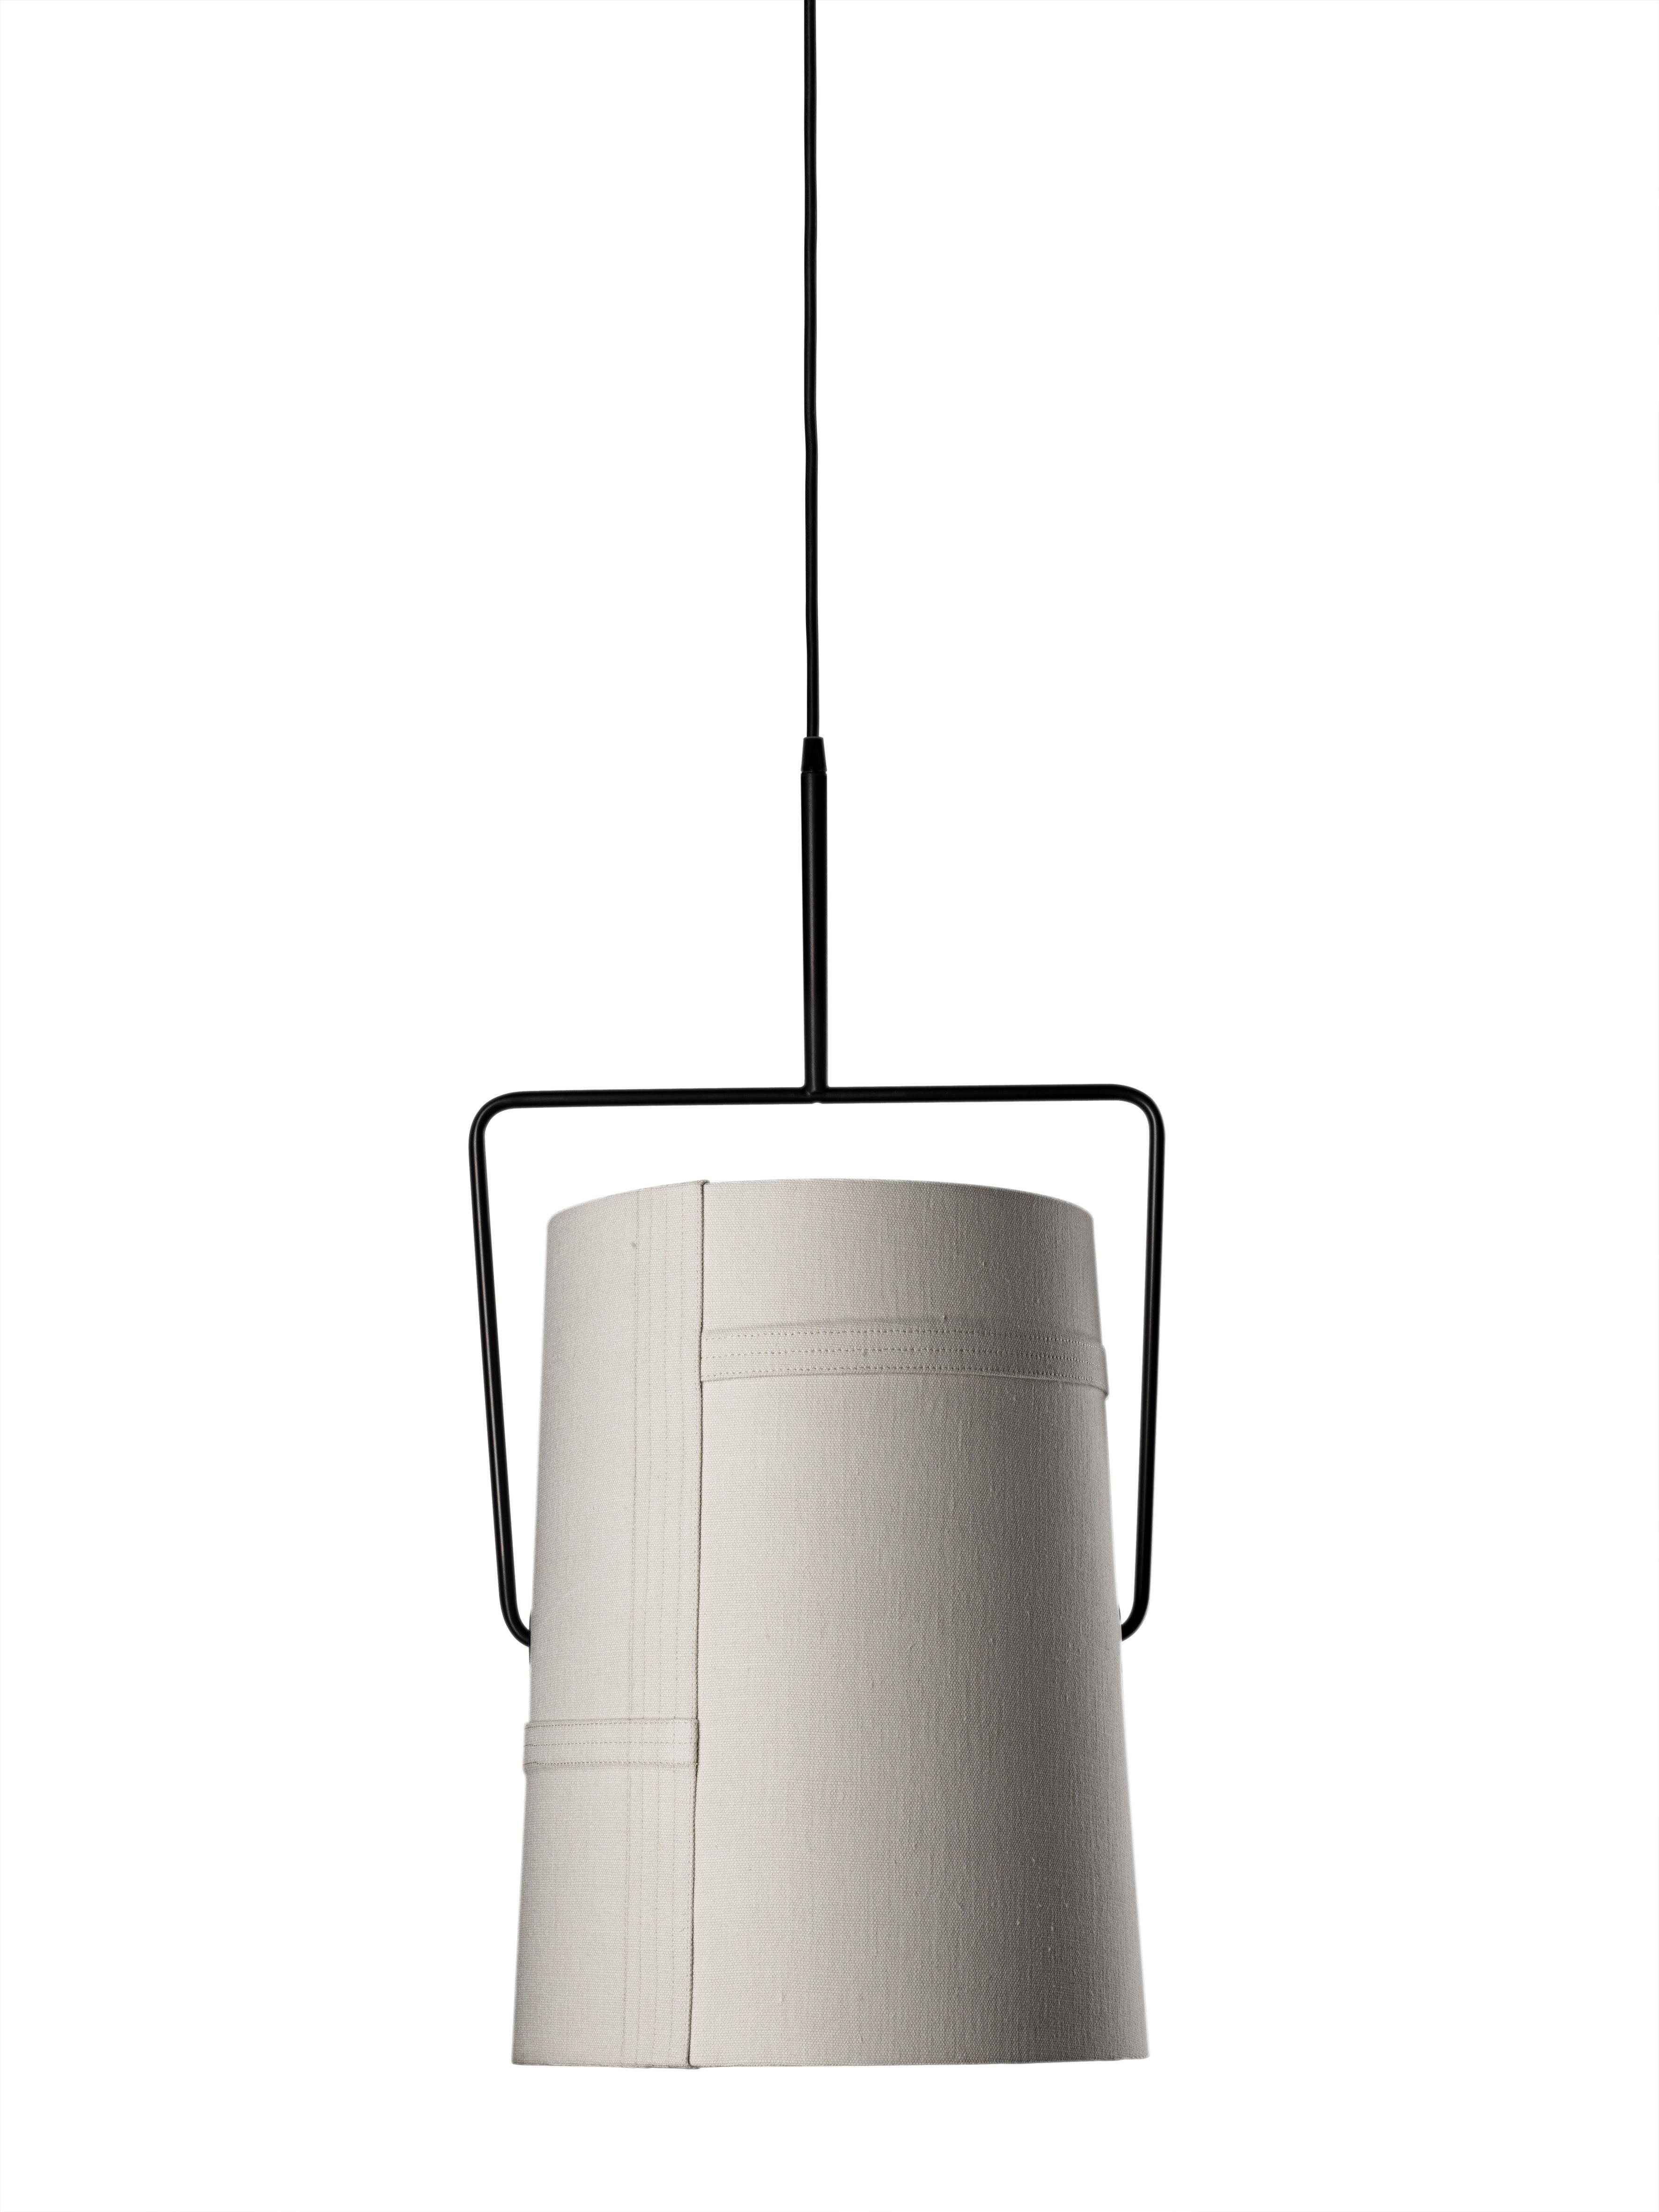 Lighting - Pendant Lighting - Fork grande Pendant by Diesel with Foscarini - Ivory - Ø 37 cm x H 70 cm - Anodized metal, Fabric